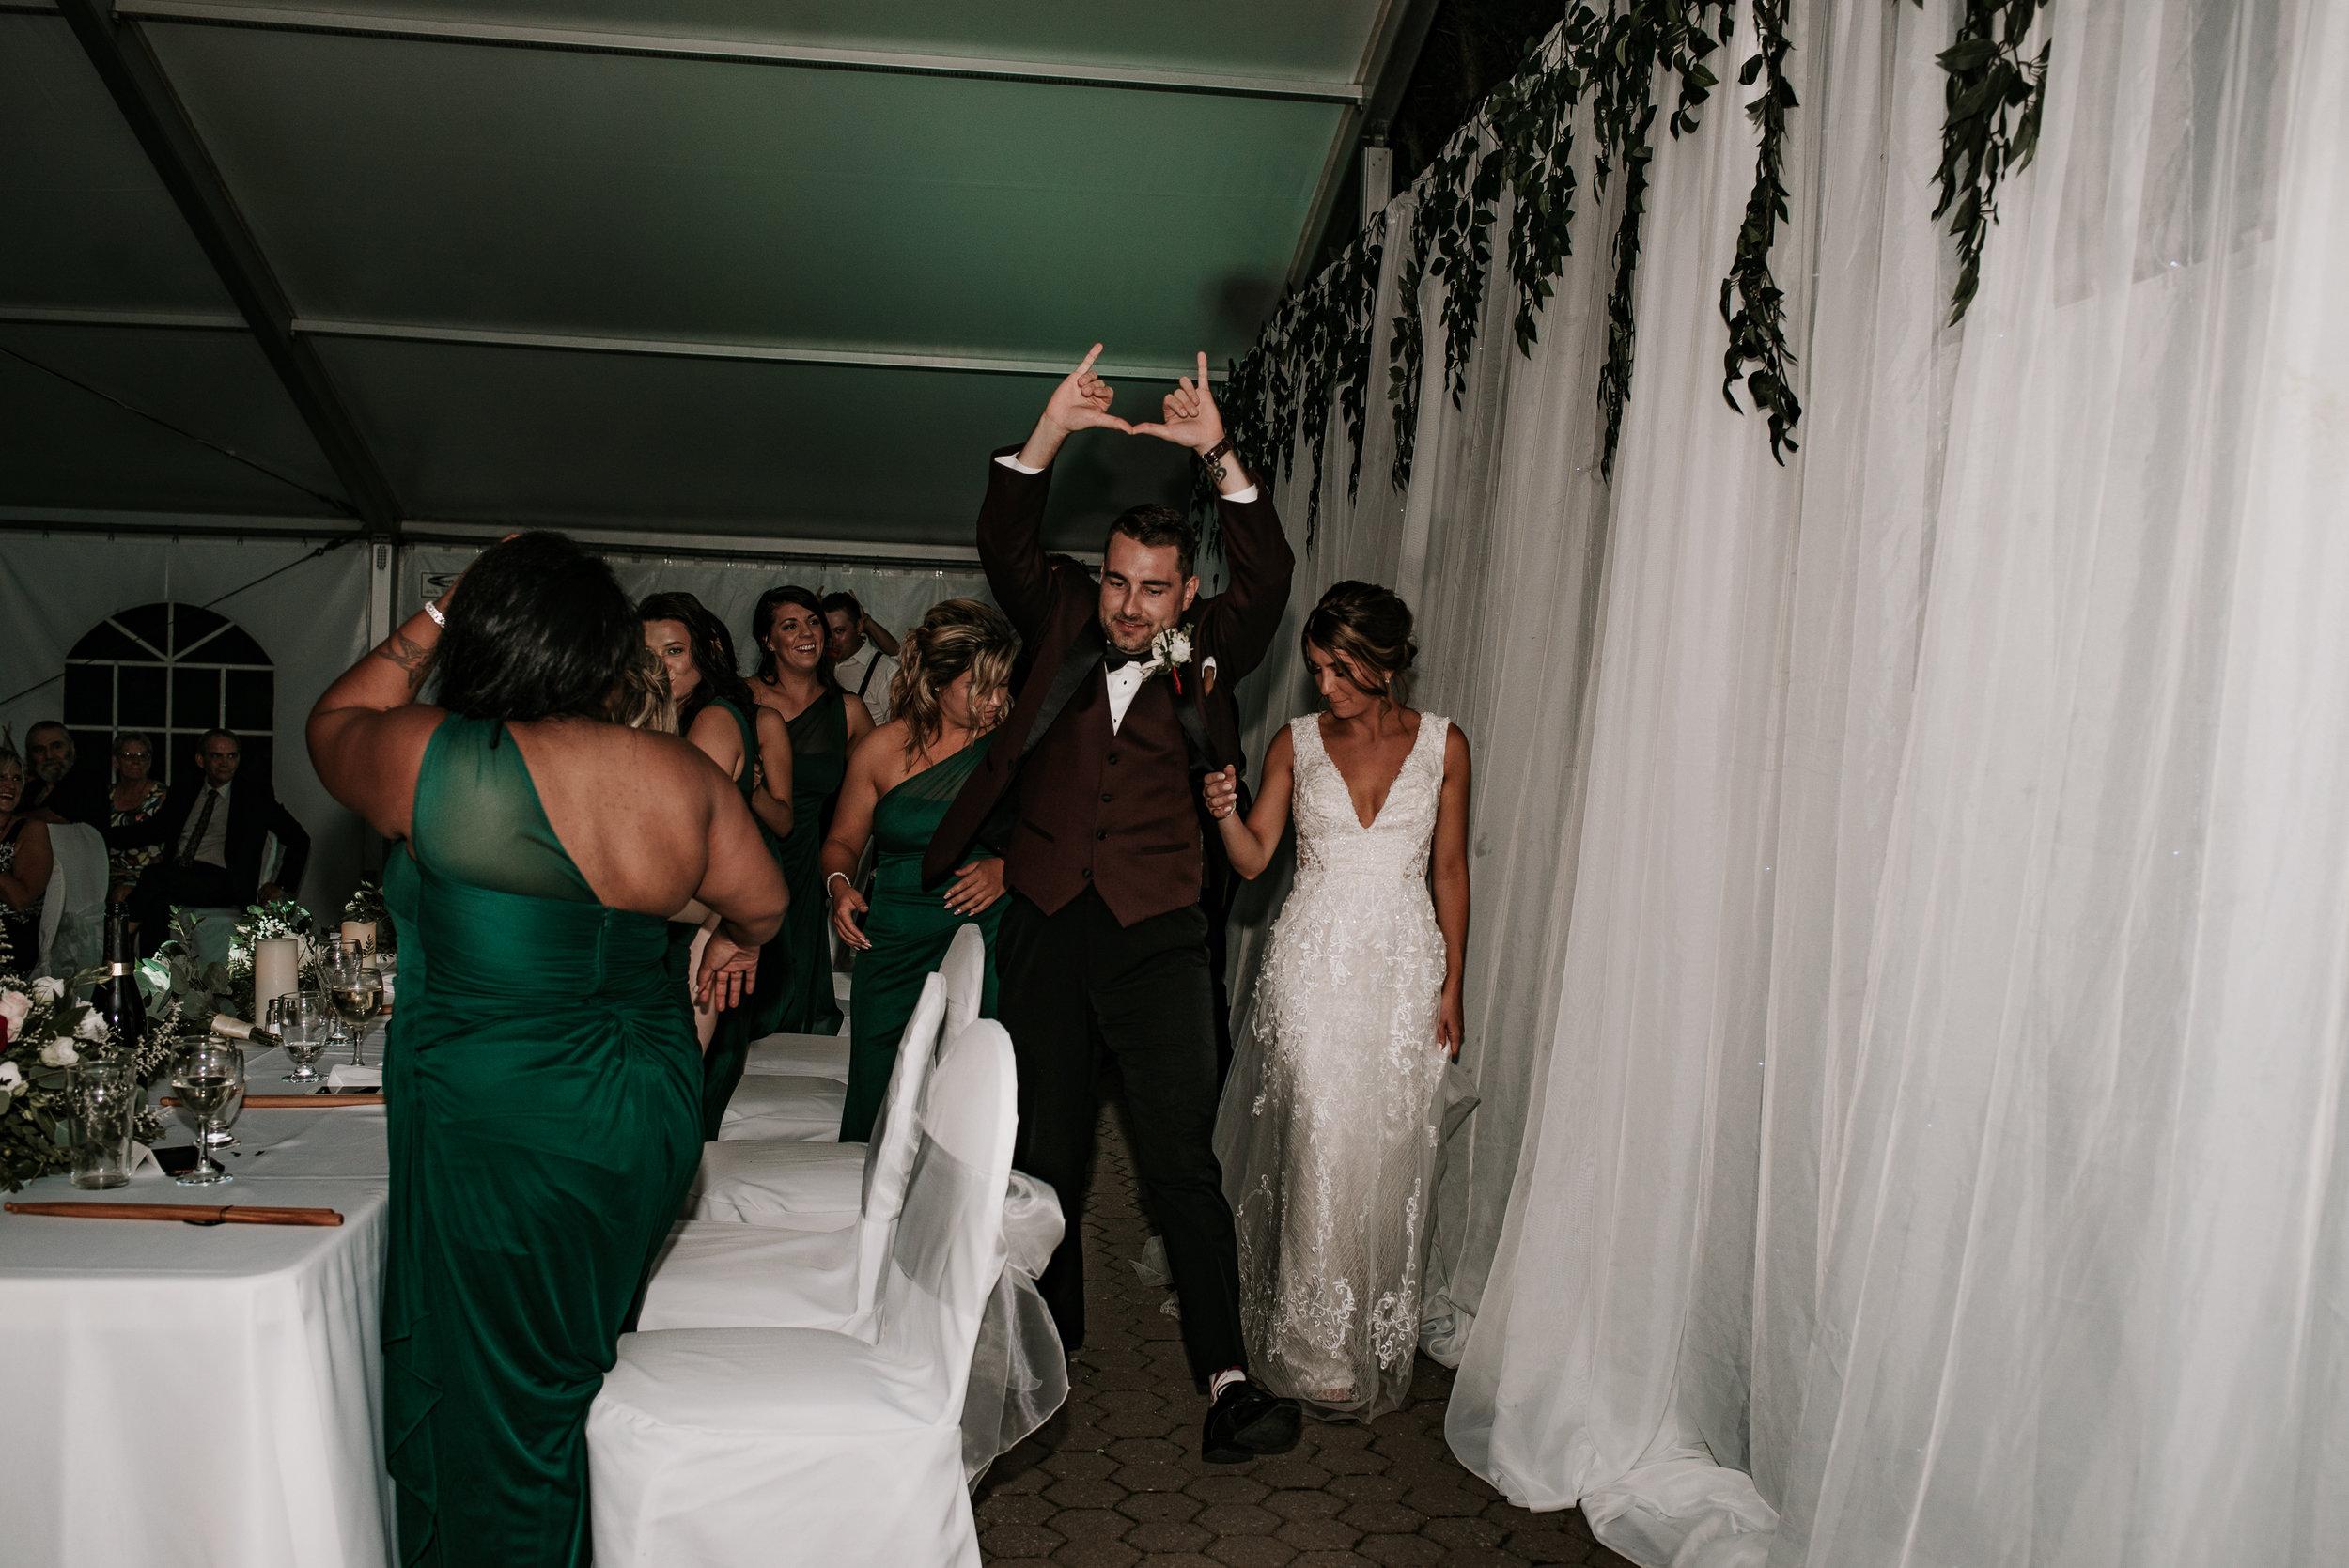 Claremont_fourseasons_Wedding-494.jpg